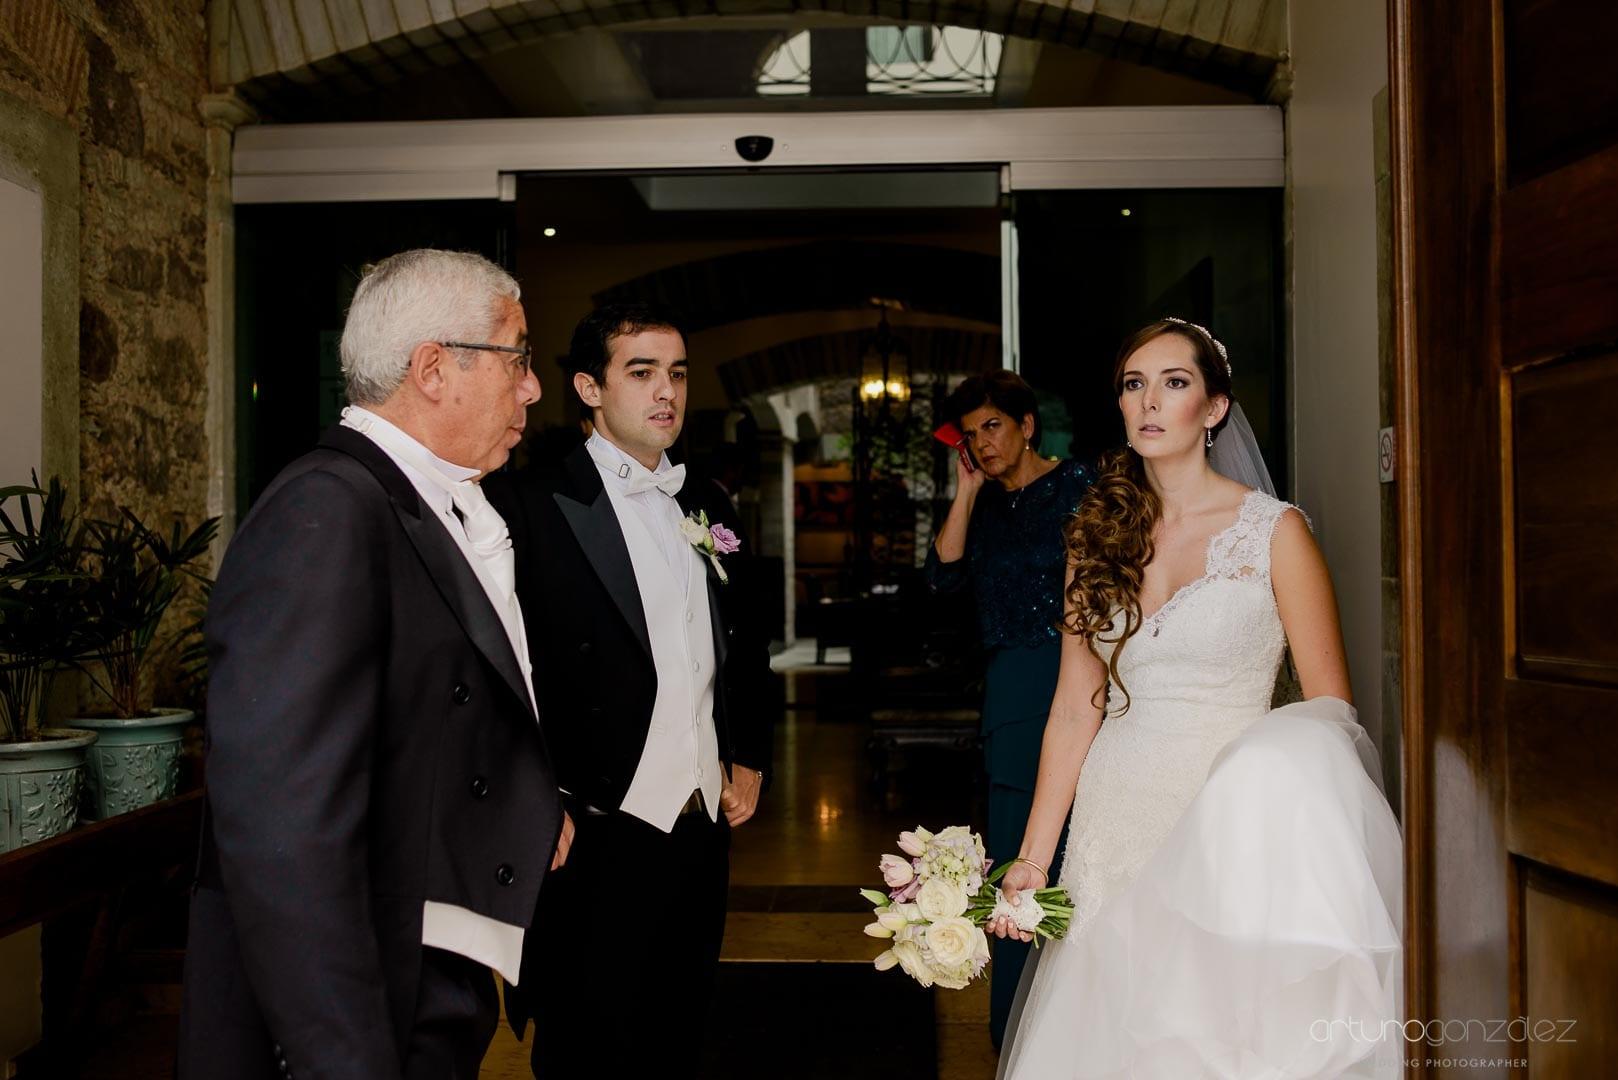 fotografo-de-bodas-en-guanajuato-23